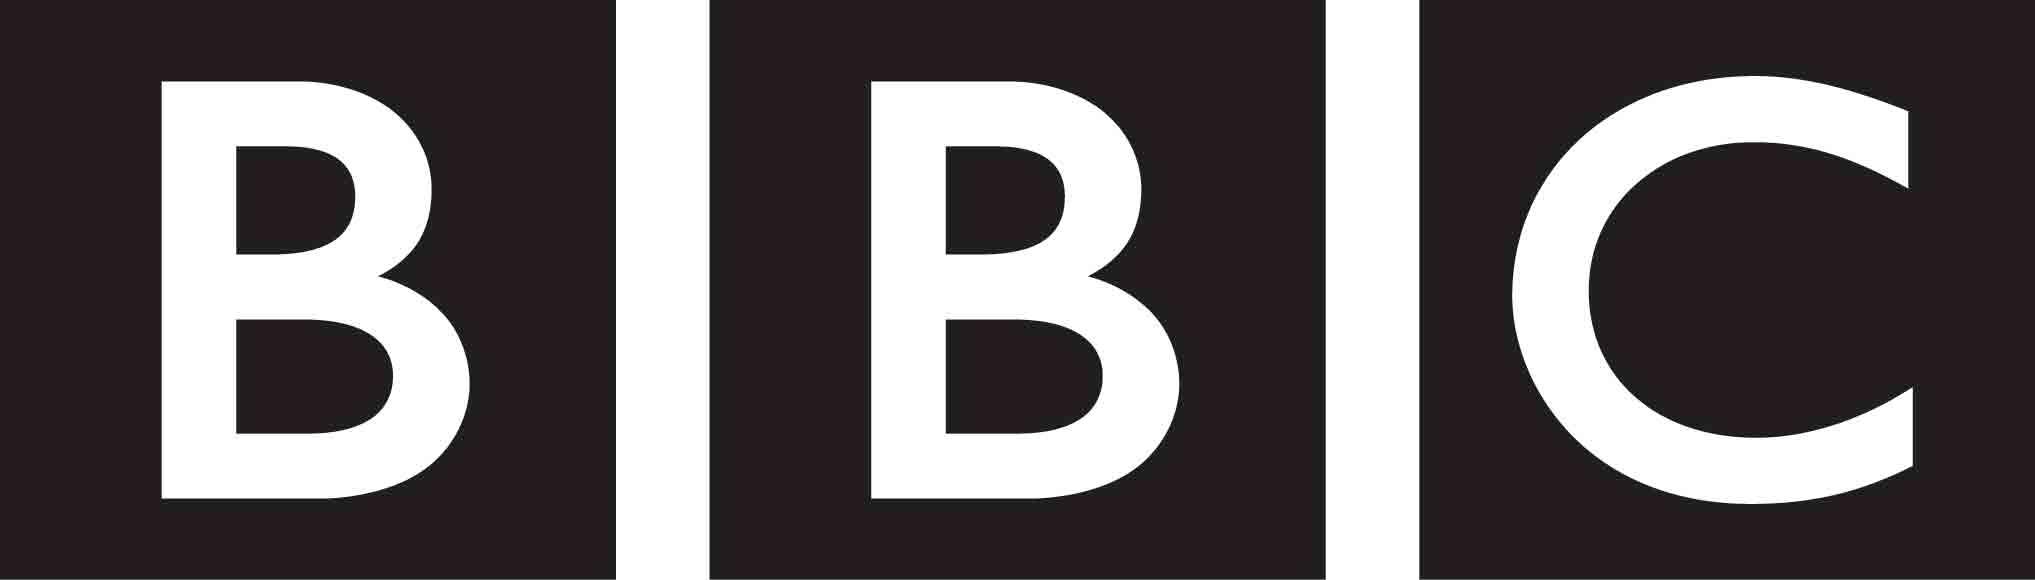 Intense-Public-Protection-BBC-logo.jpg